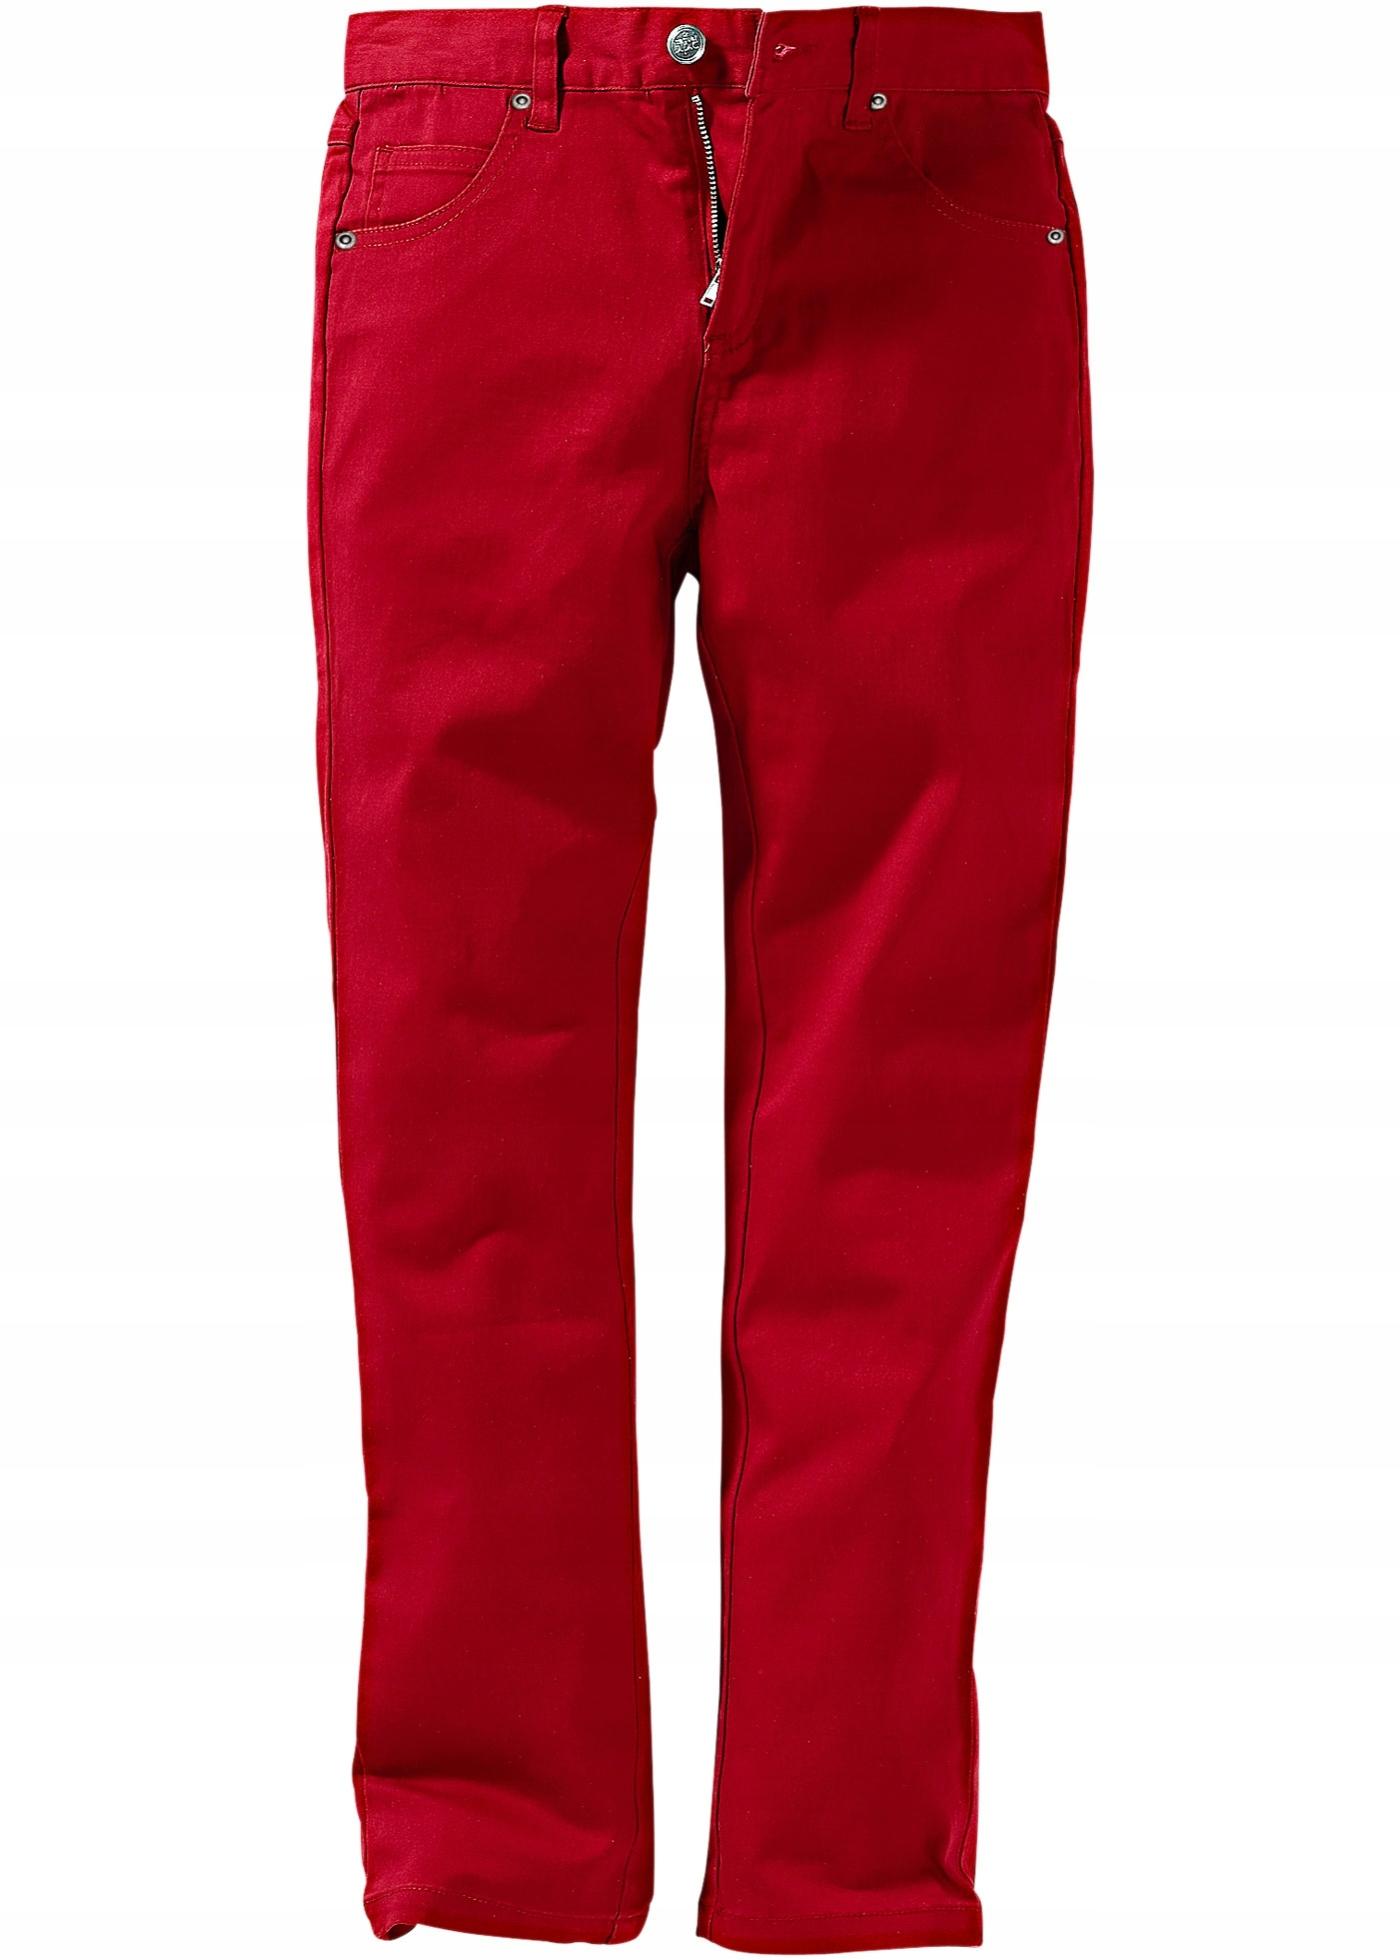 E236 BPC Spodnie twillowe Slim Fit 158 pas:76-84